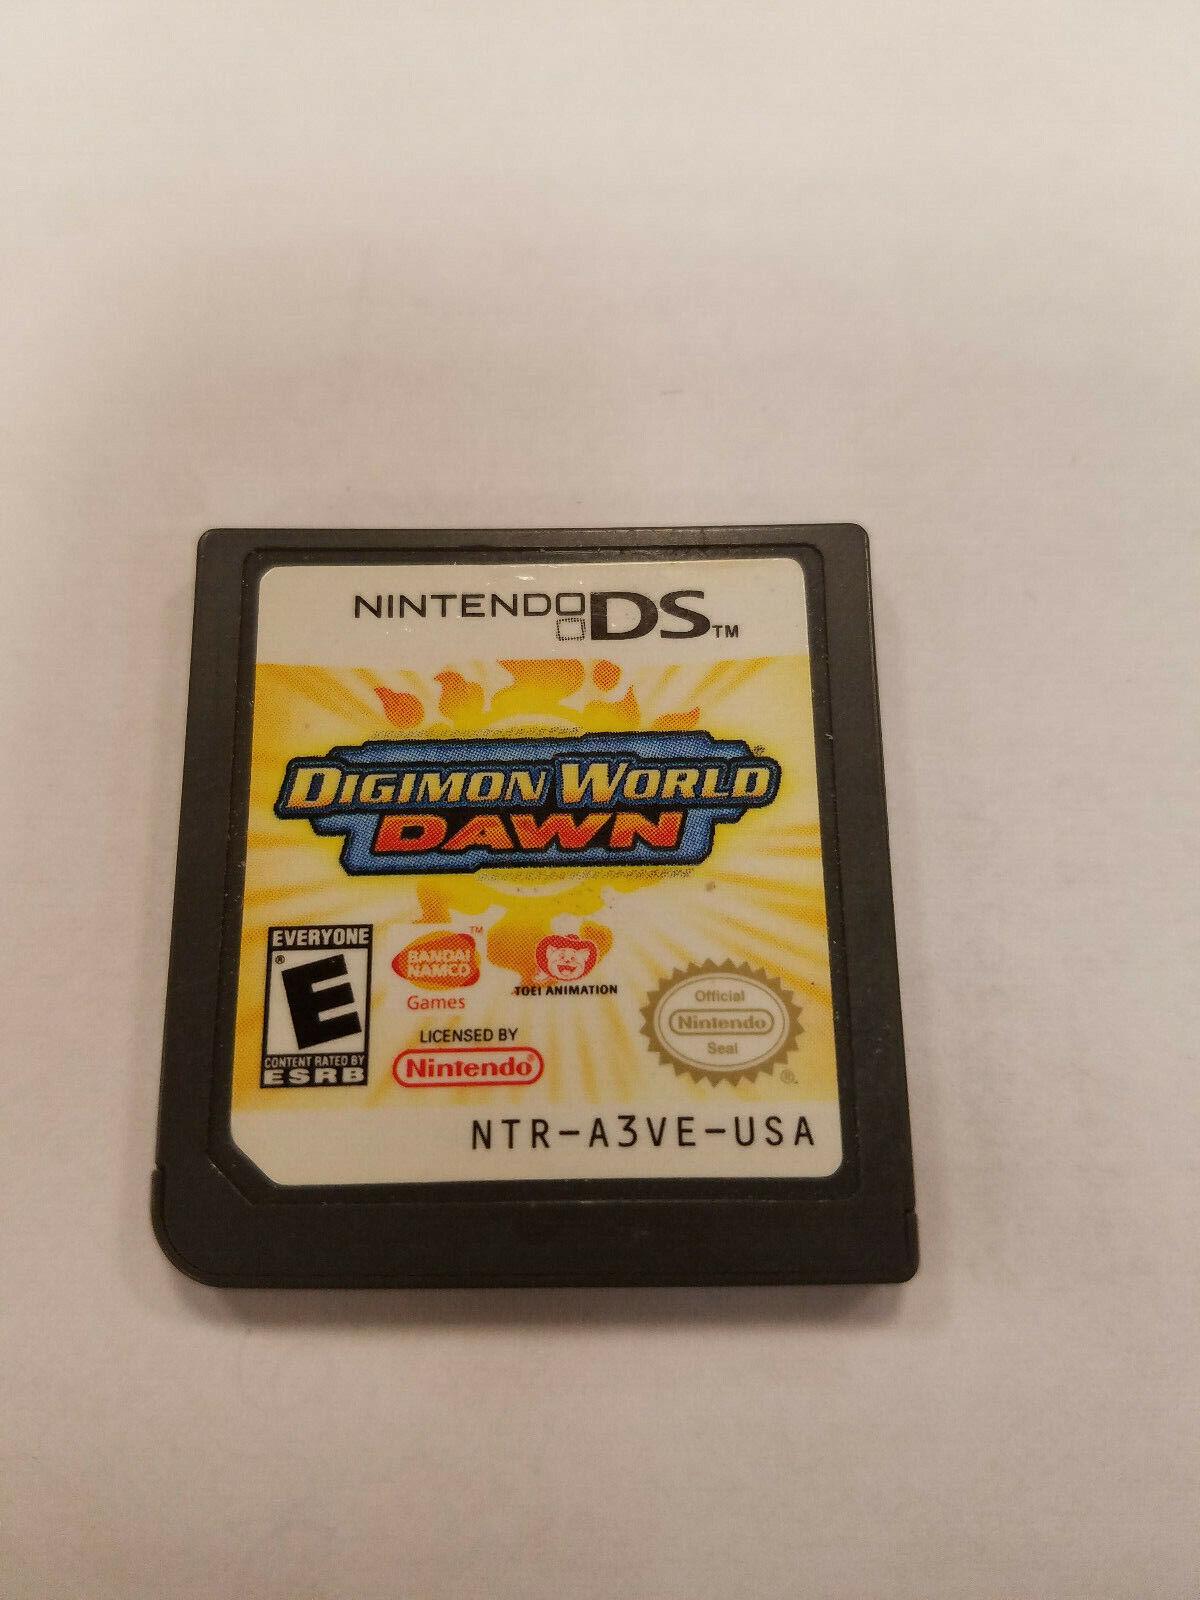 Digimon World: Dawn (Nintendo DS, 2007) on digimon world dawn action replay codes, digimon world dawn artwork, digimon world dawn review, digimon world dawn sprites, digimon world dawn guide,